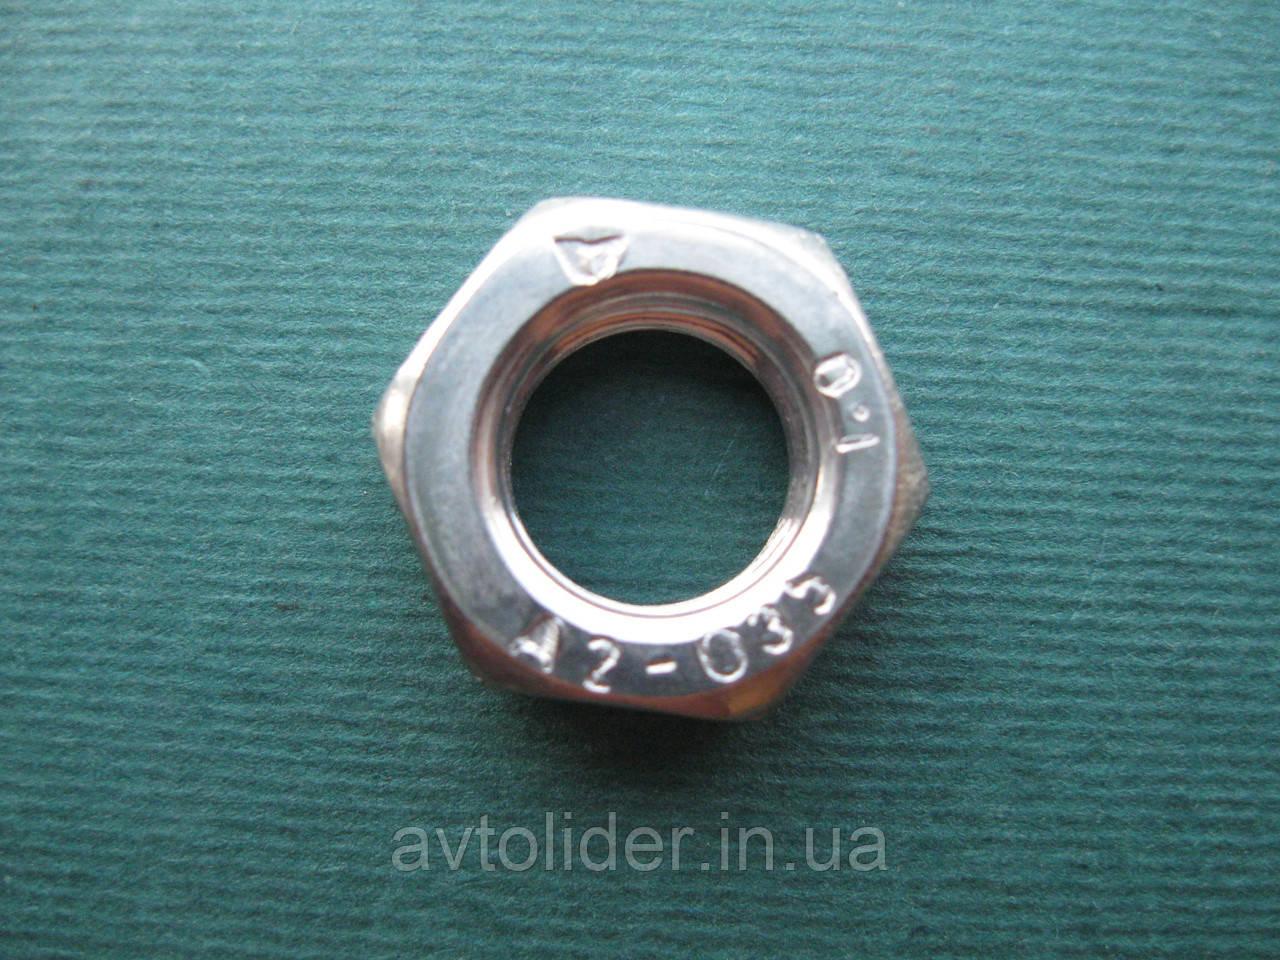 DIN 439 F (ГОСТ 5615-70; ISO 8675) - Нержавеющая гайка шестигранная низкая с мелким шагом резьбы